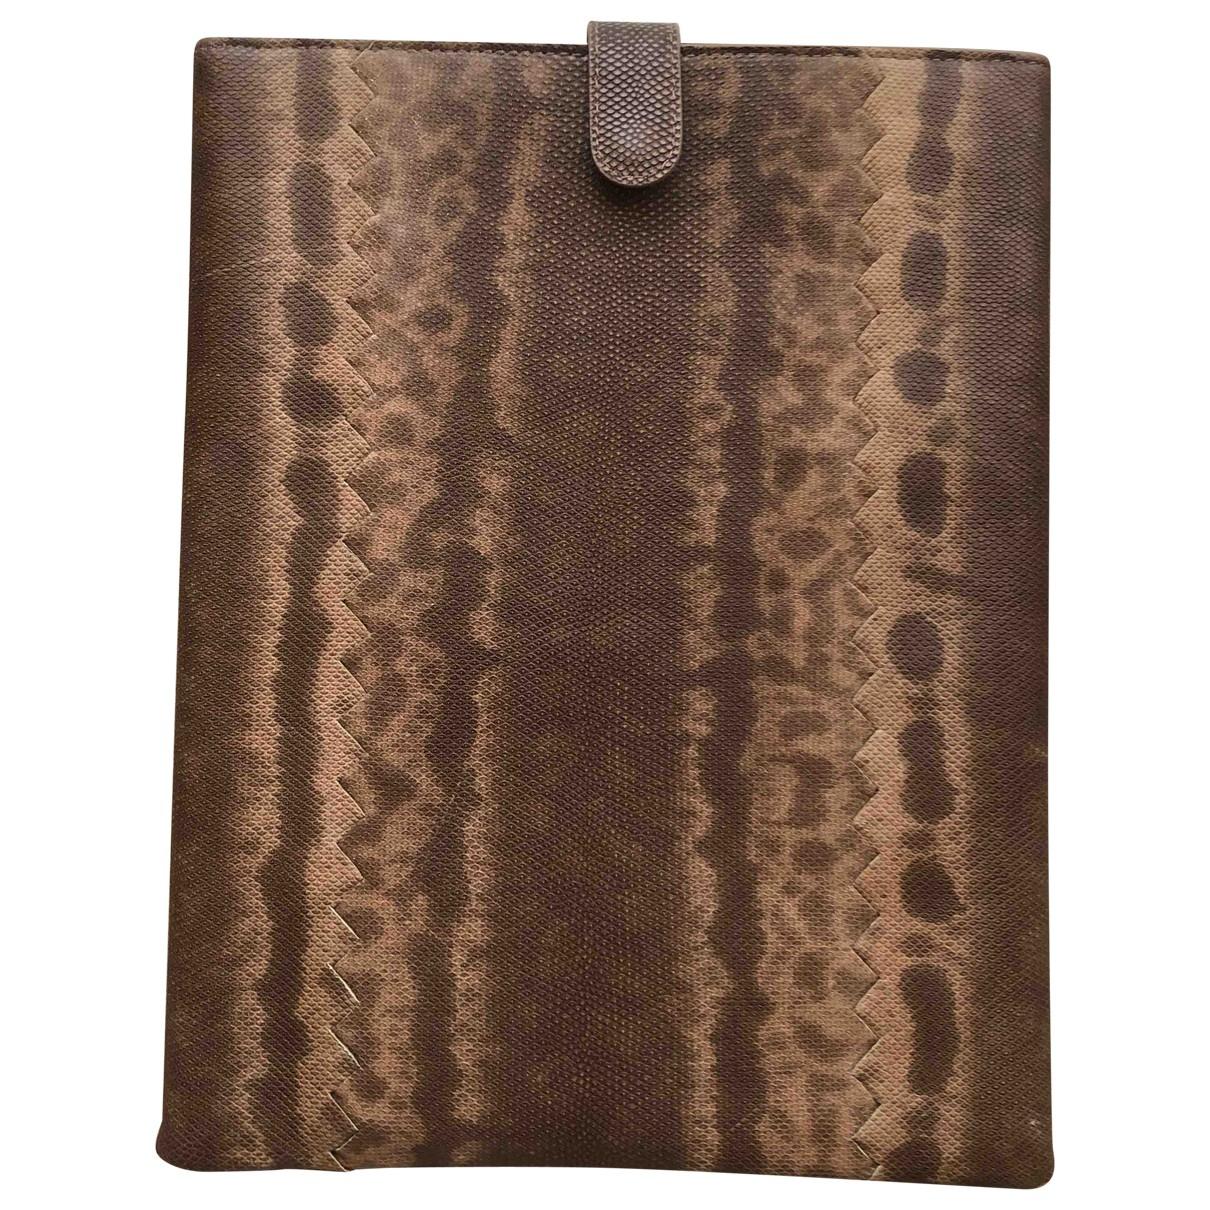 Bottega Veneta \N Camel Lizard Accessories for Life & Living \N